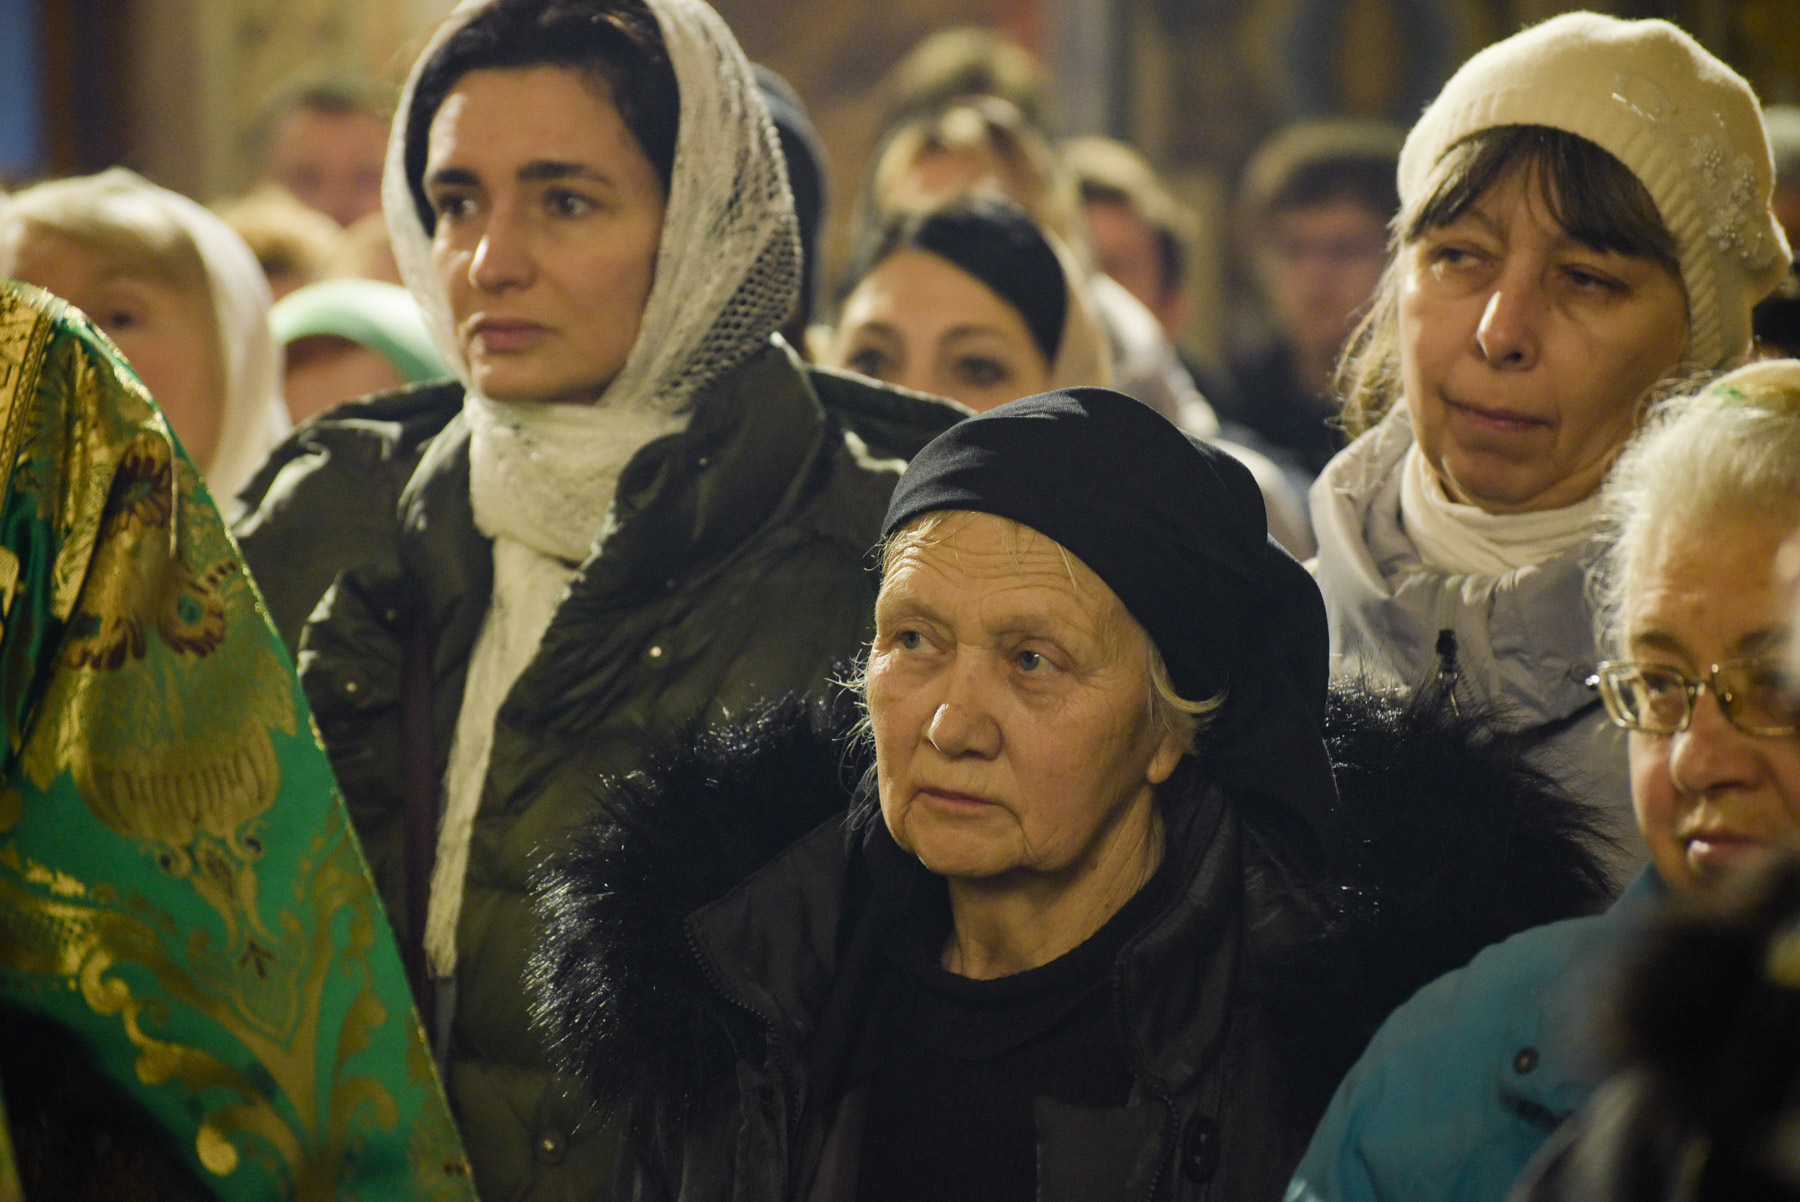 photos of orthodox christmas 0054 2